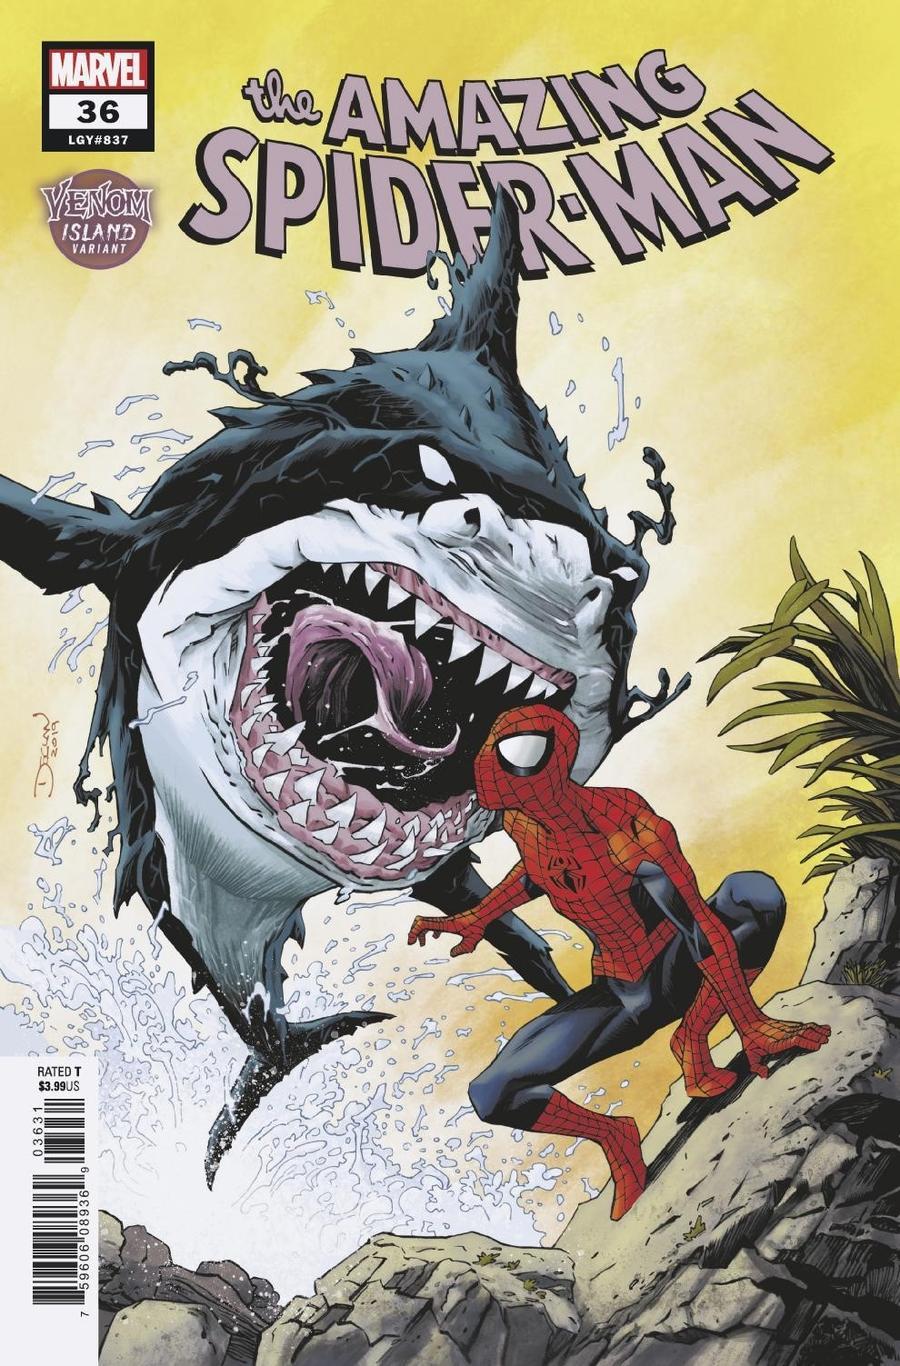 Amazing Spider-Man Vol 5 #36 Cover C Variant Declan Shalvey Venom Island Cover (2099 Tie-In)